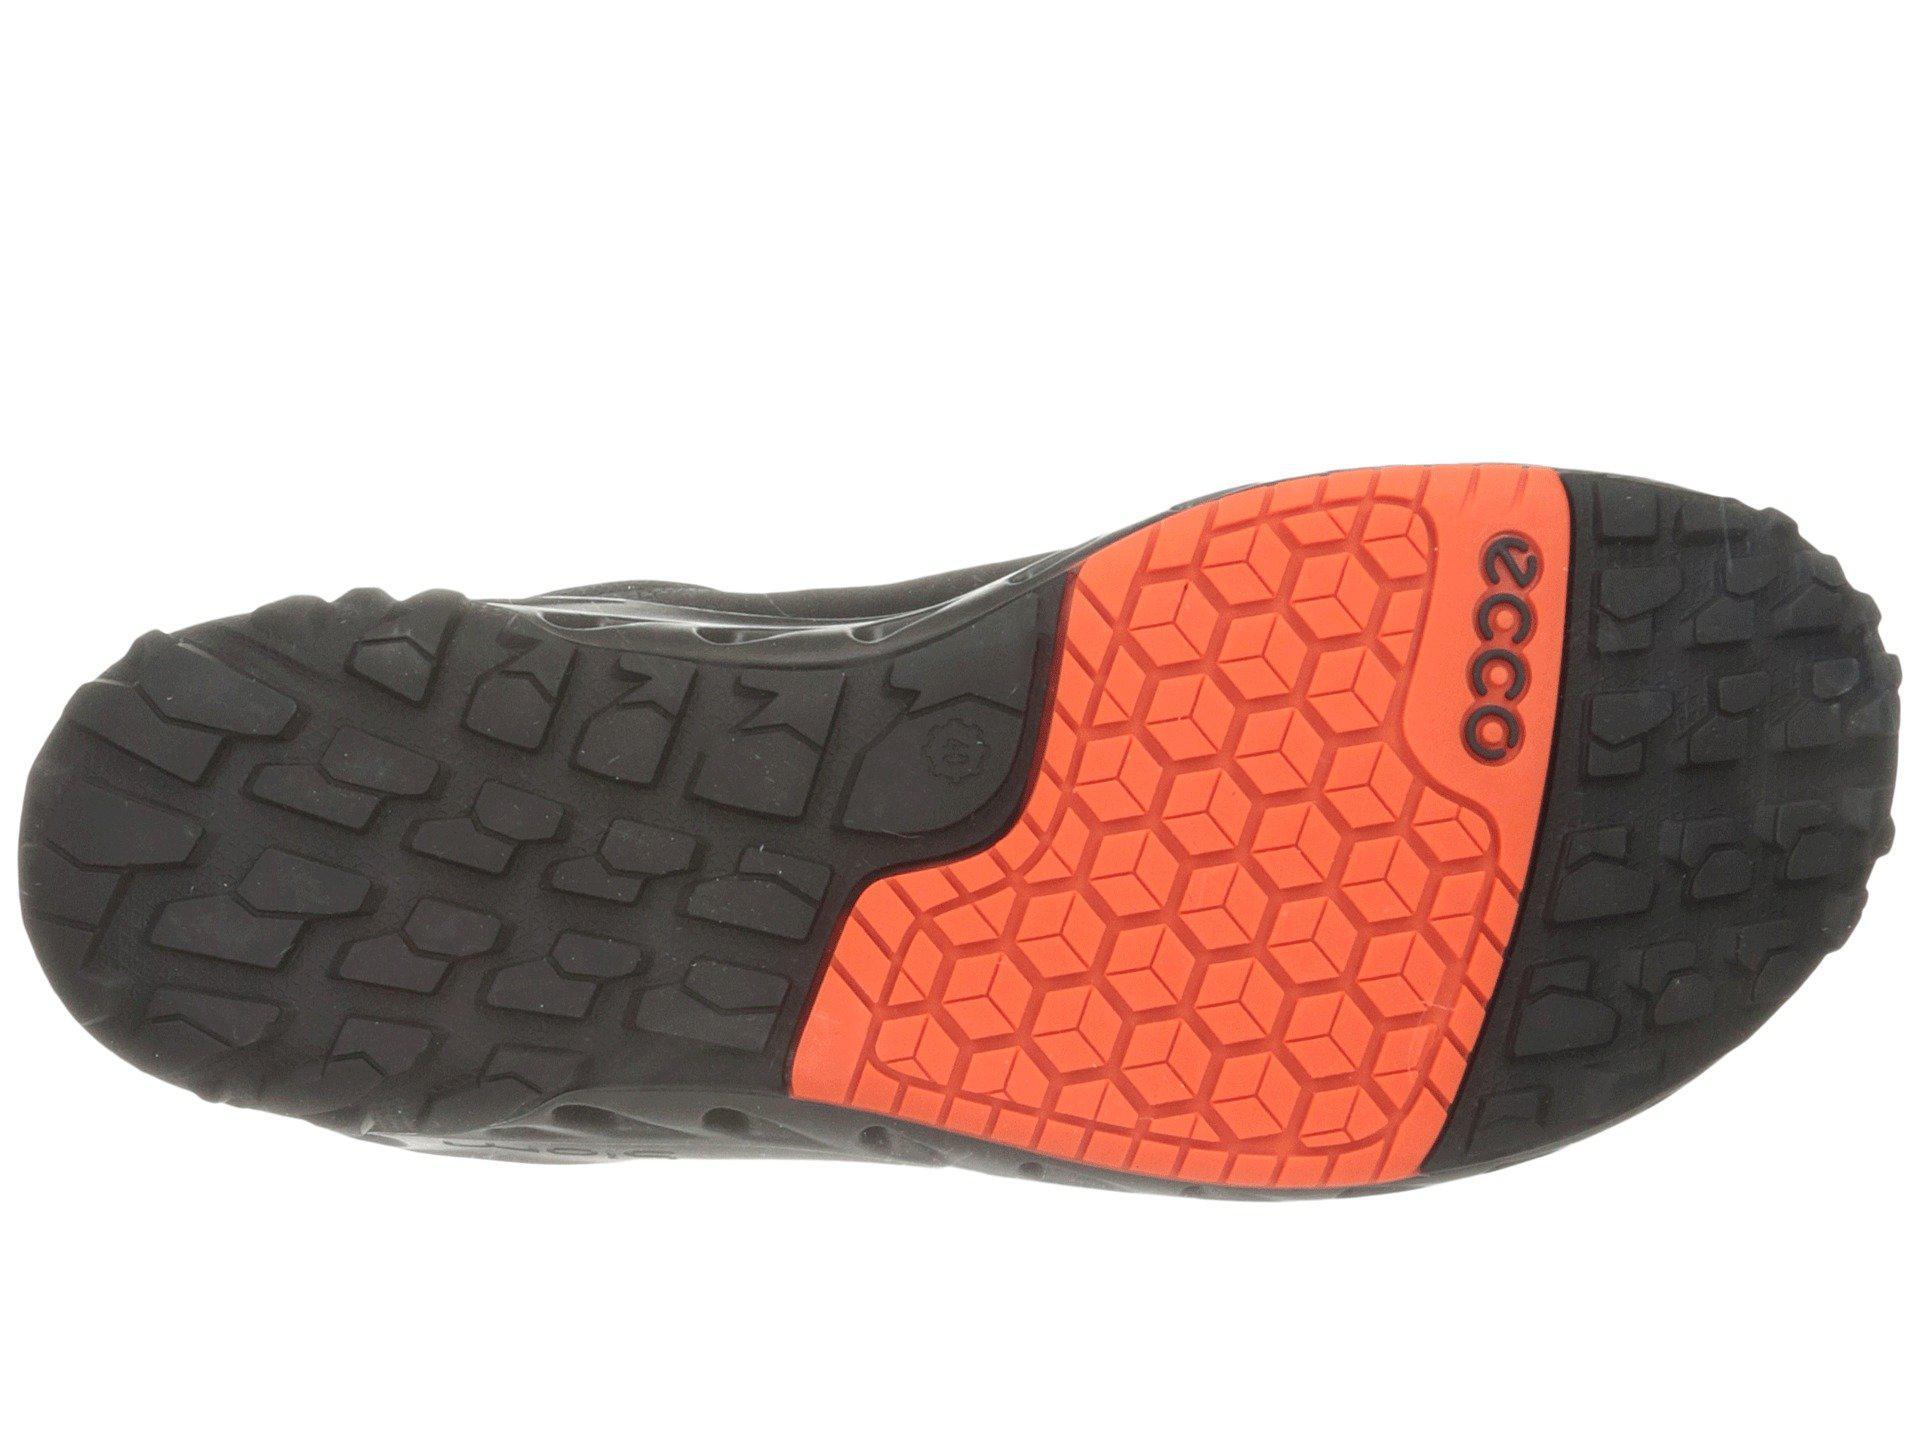 2404c74d5c3107 Ecco - Biom Venture Gtx Tie (black black) Men s Tennis Shoes for Men. View  fullscreen